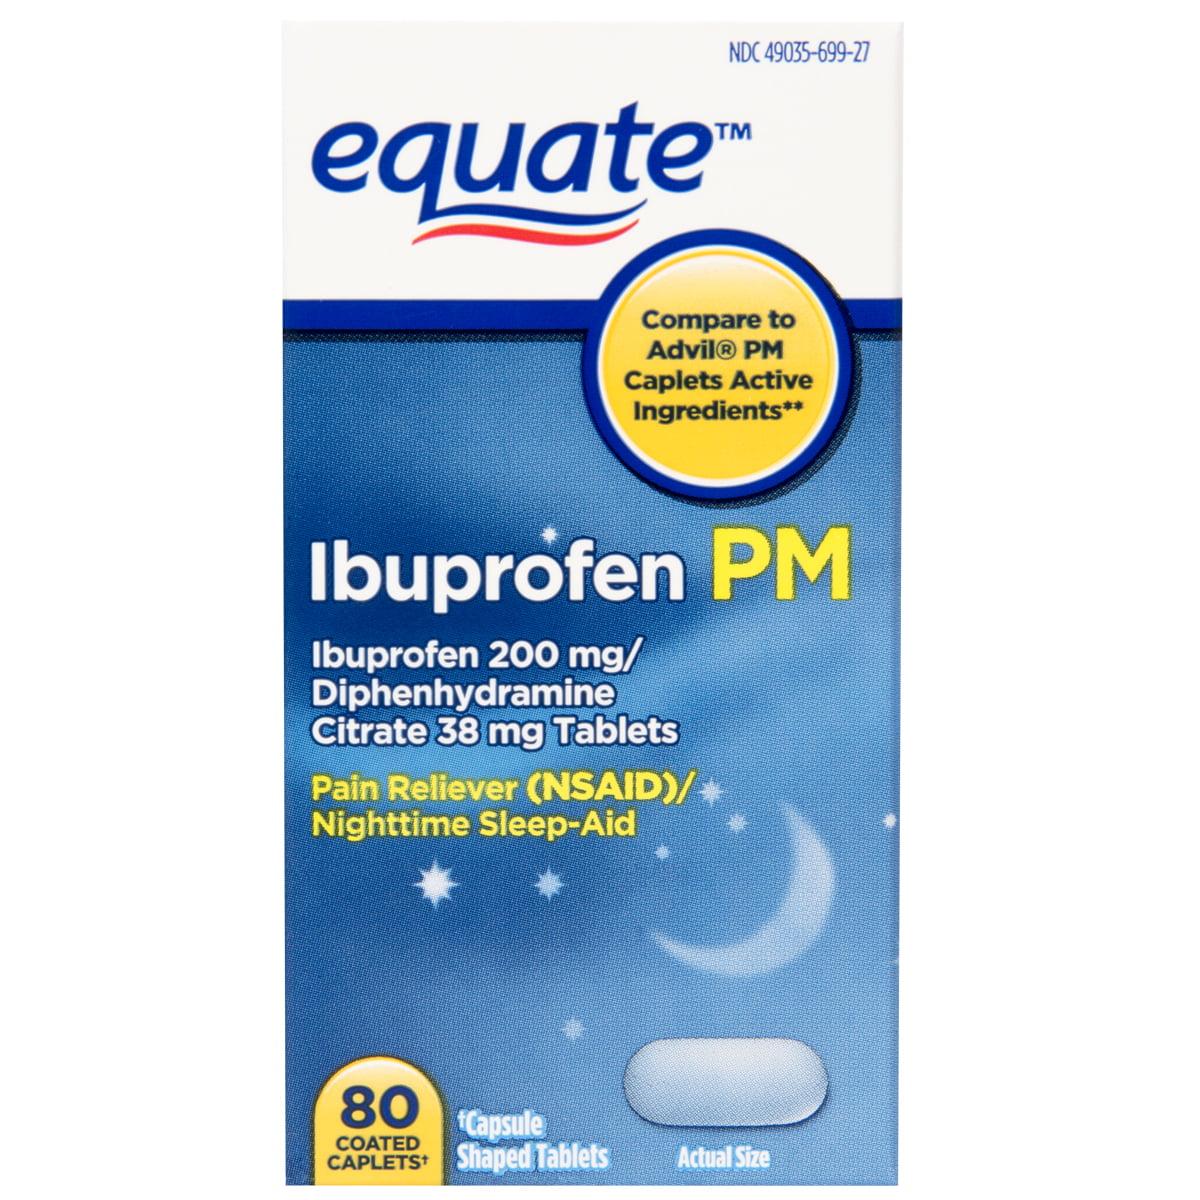 Equate Ibuprofen PM Coated Caplets, 80 count